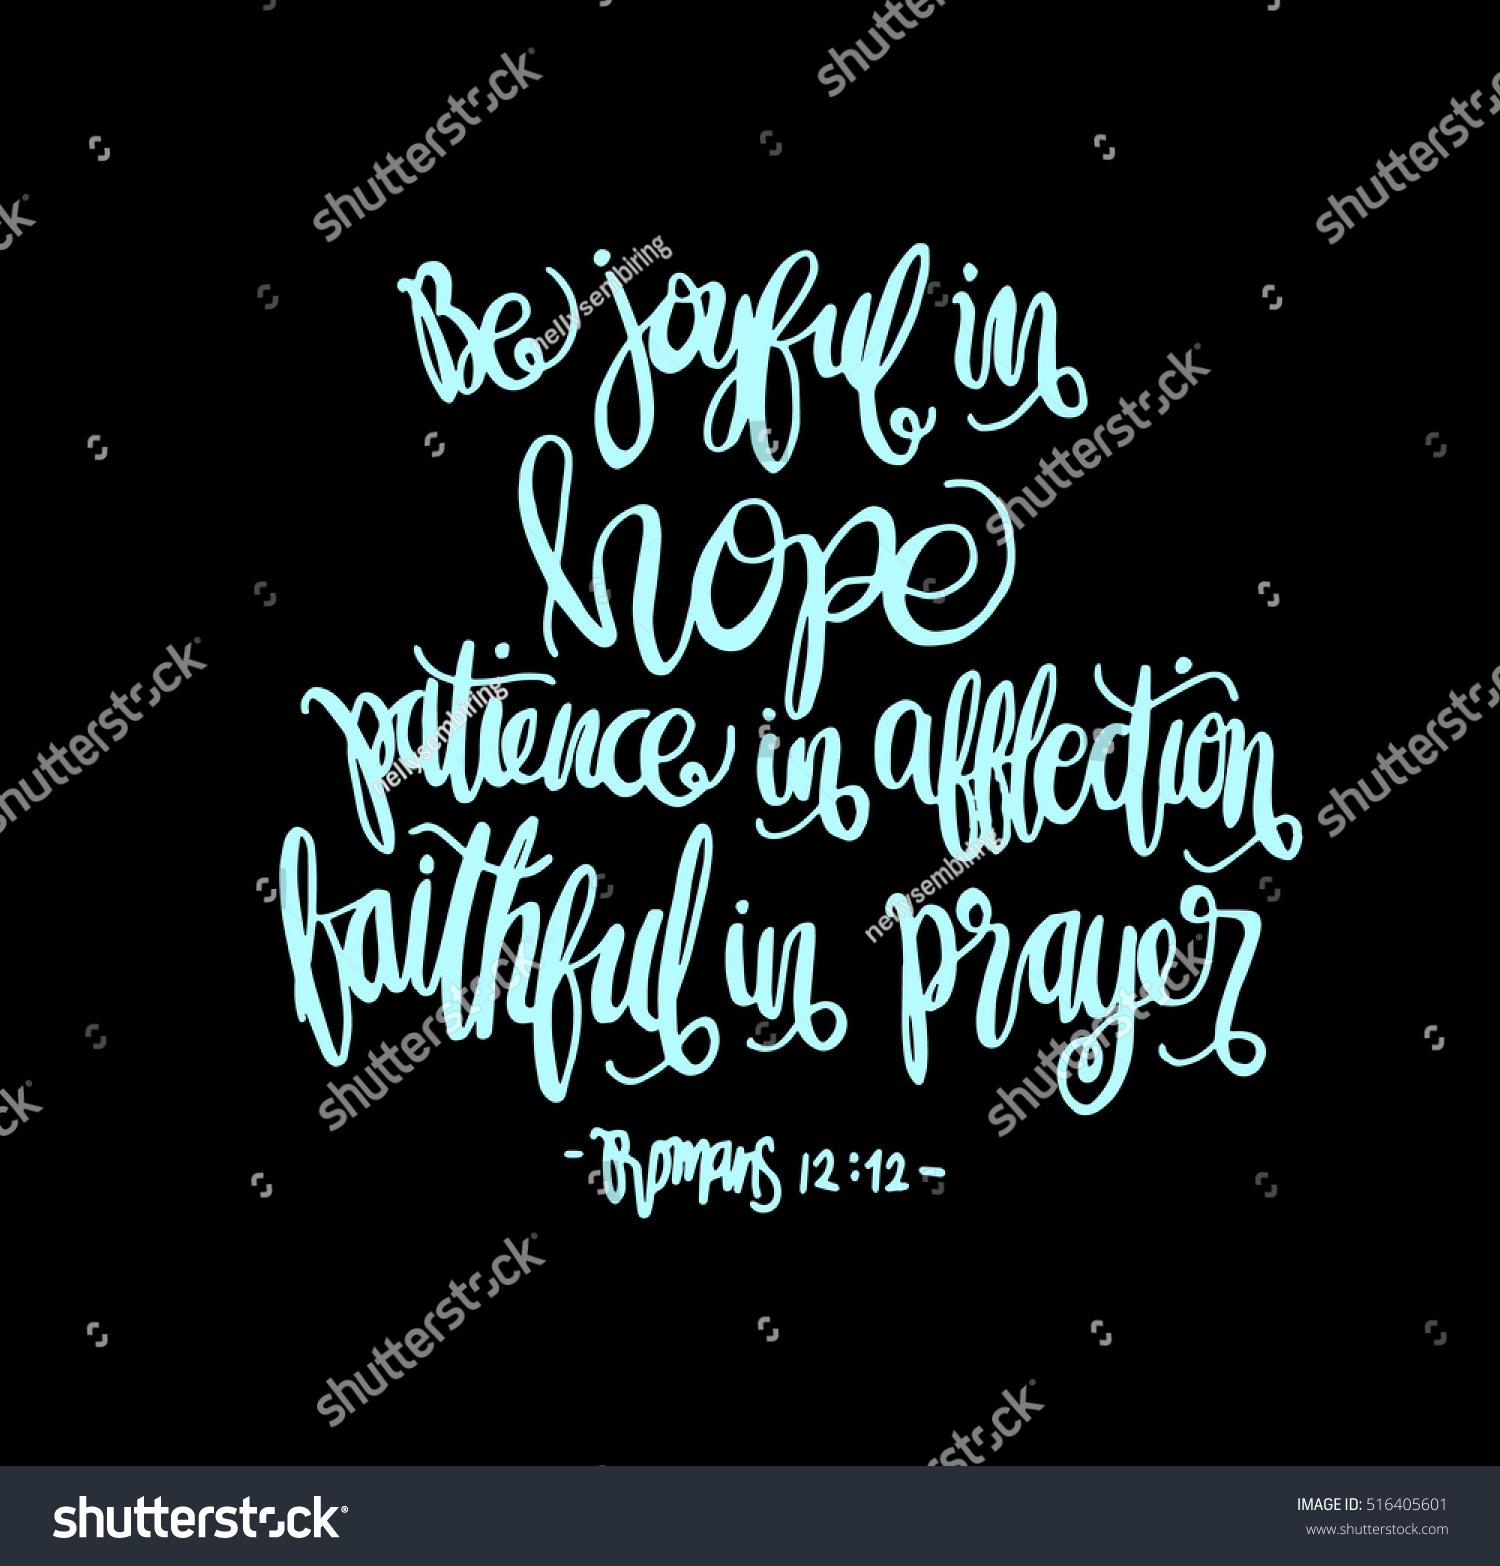 Prayer Quote Be Joyful Hope Patient Affliction Faithful Stock Vector 516405601